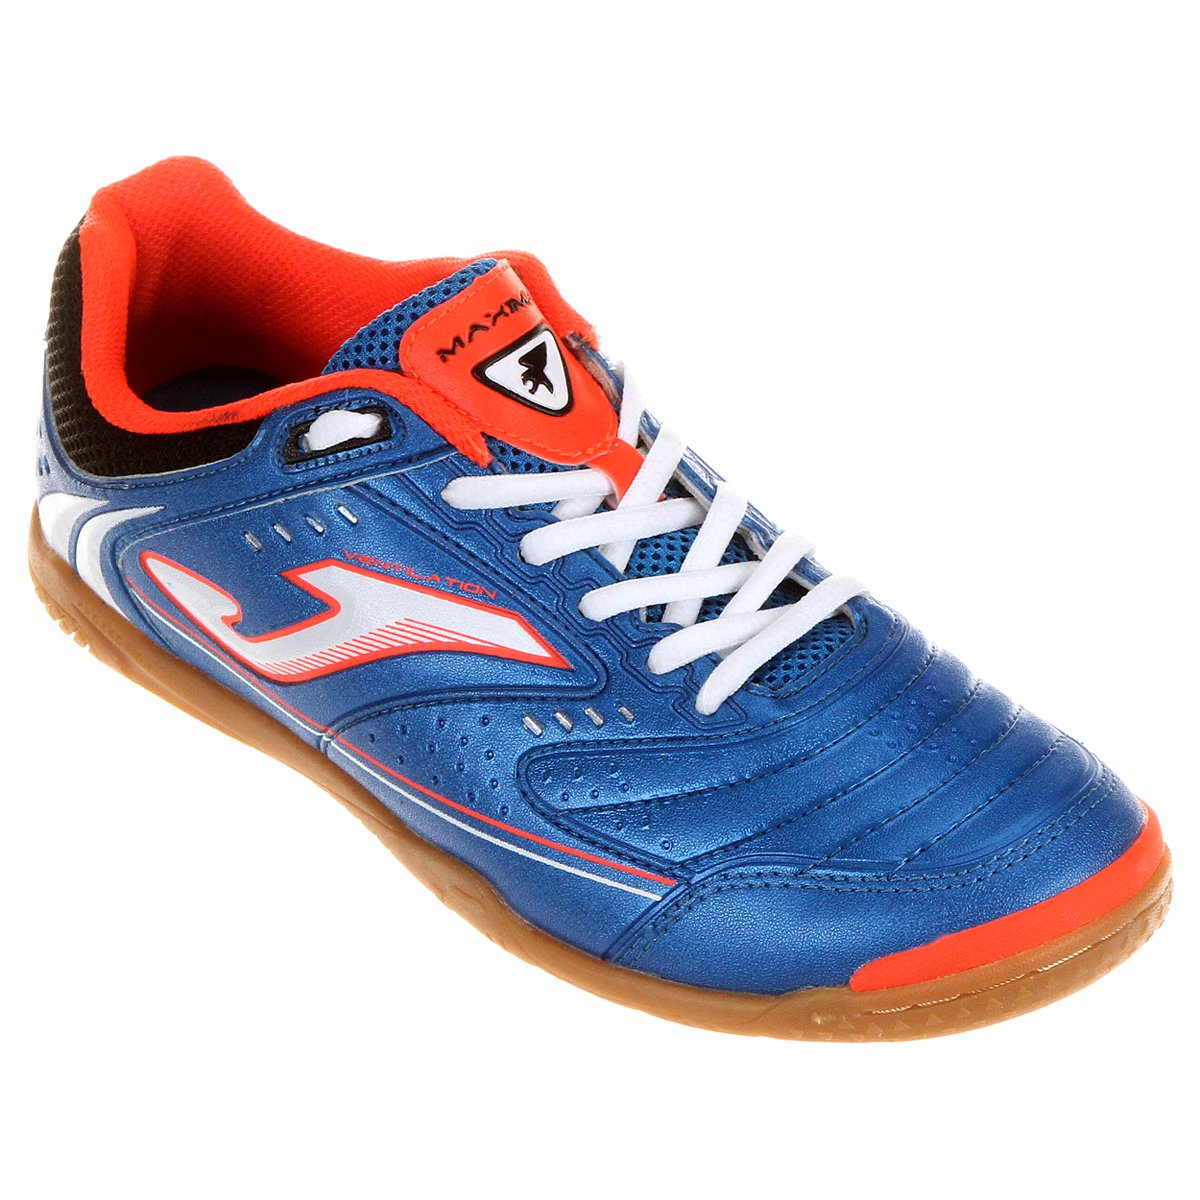 31056448b2 Chuteira Futsal Joma Maxima Masculina - Compre Agora